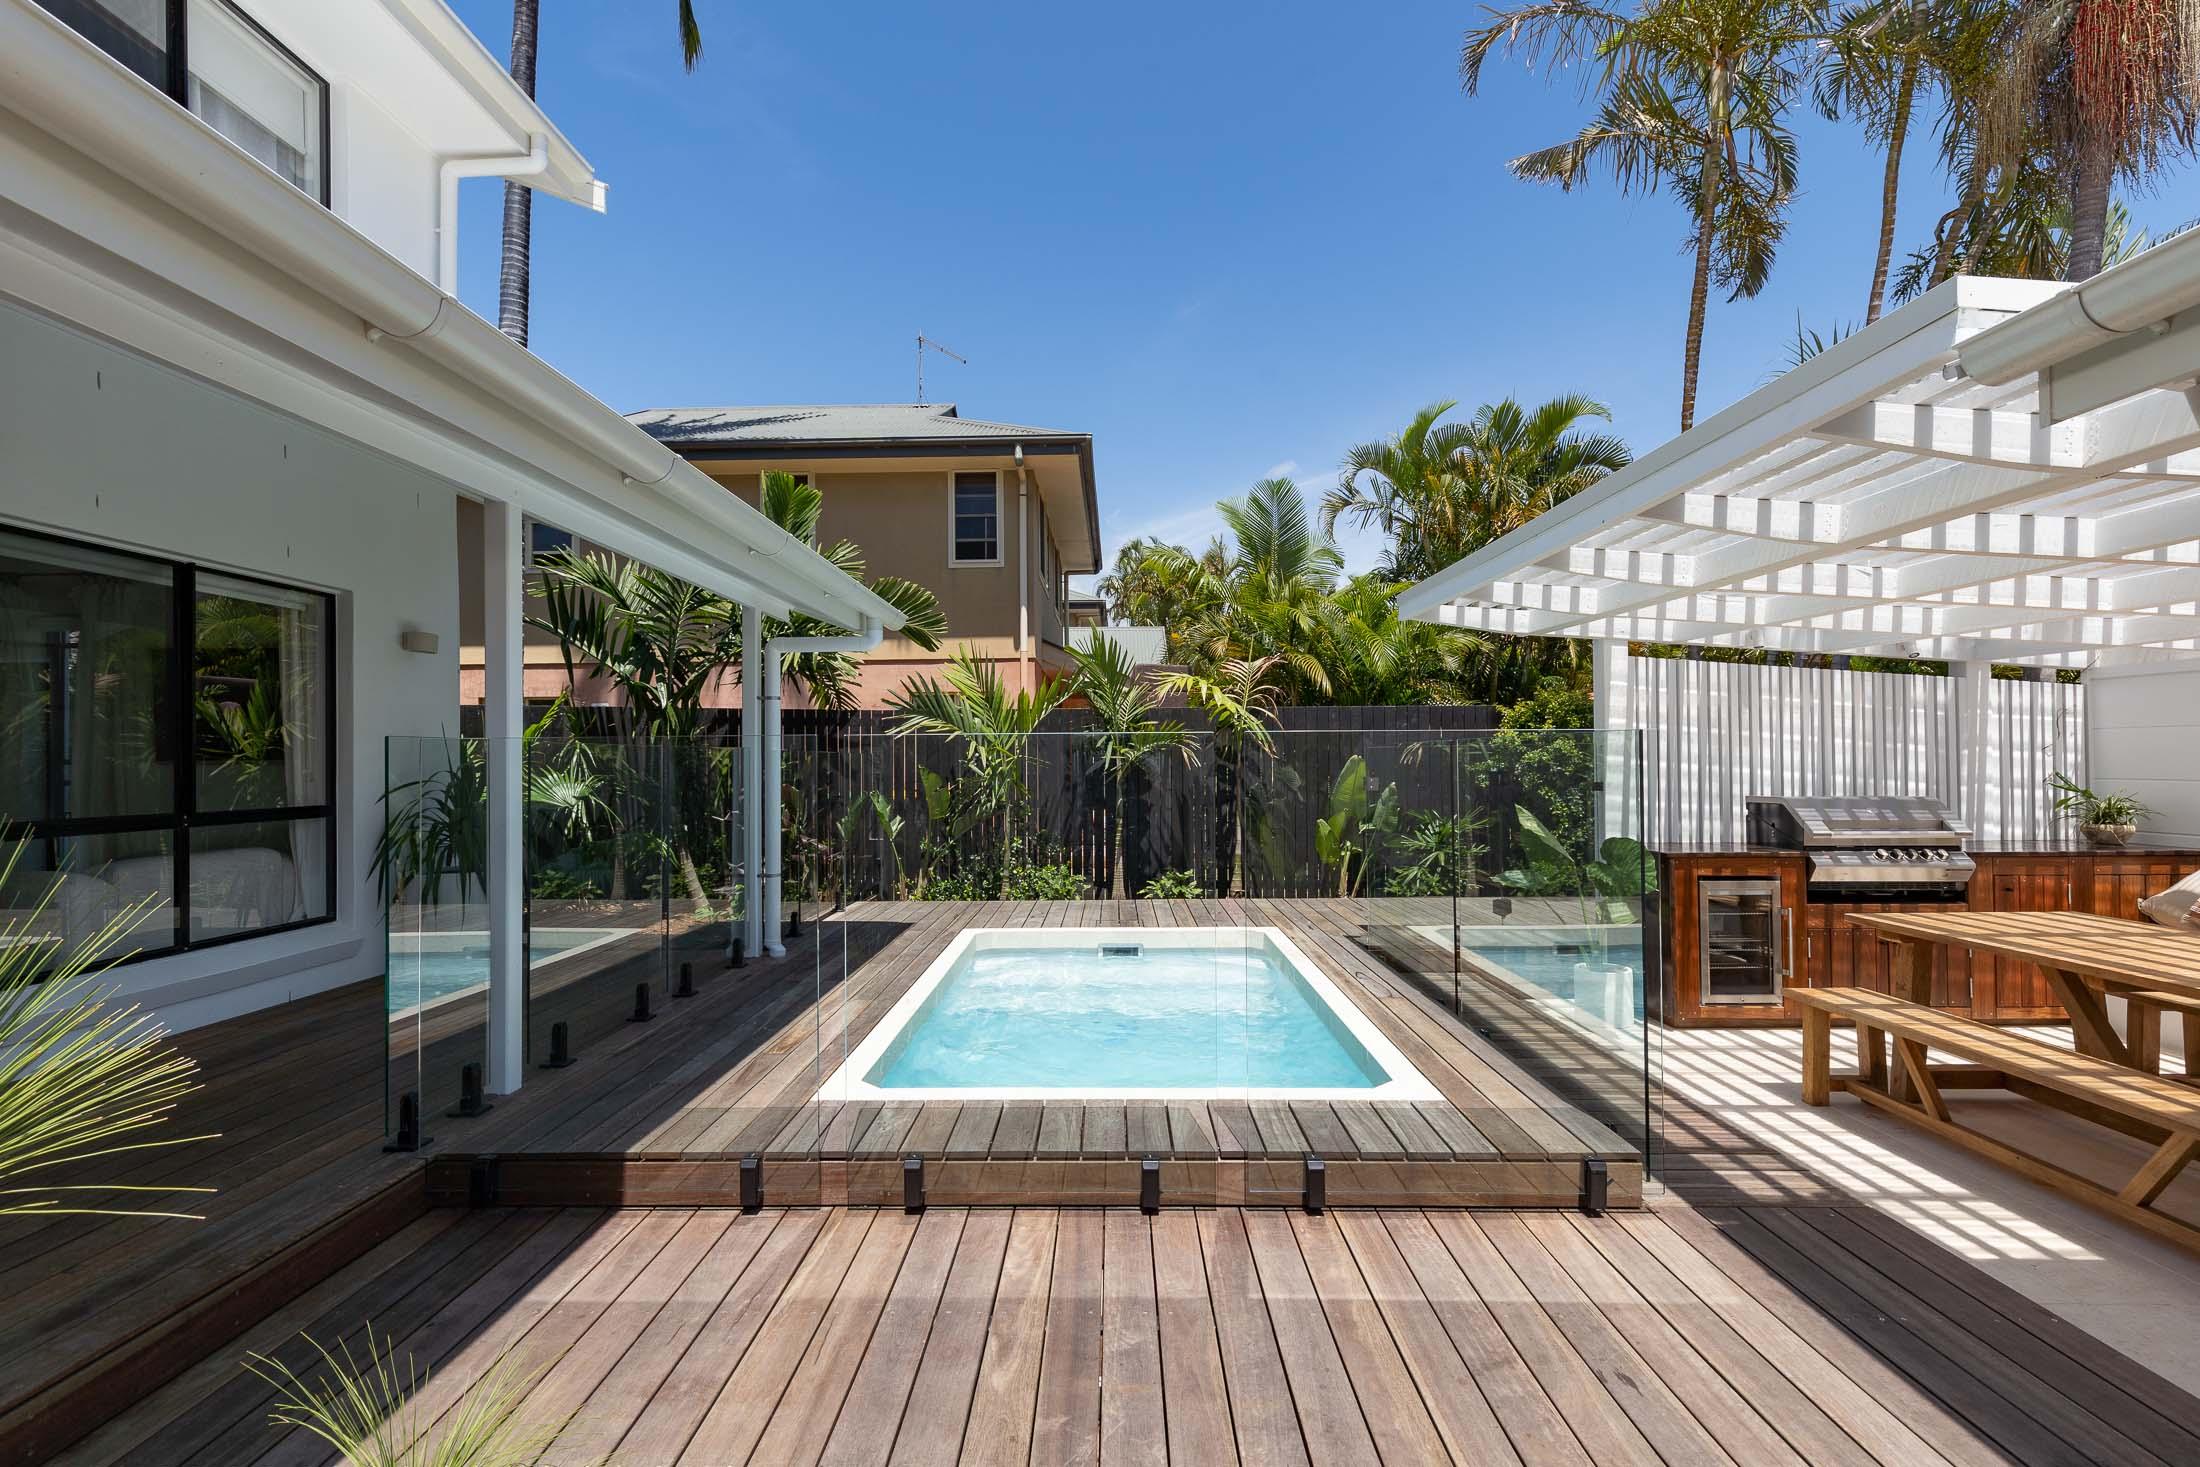 12ft x 7ft Plungie Studio Concrete Plunge Pool in Kona Coast